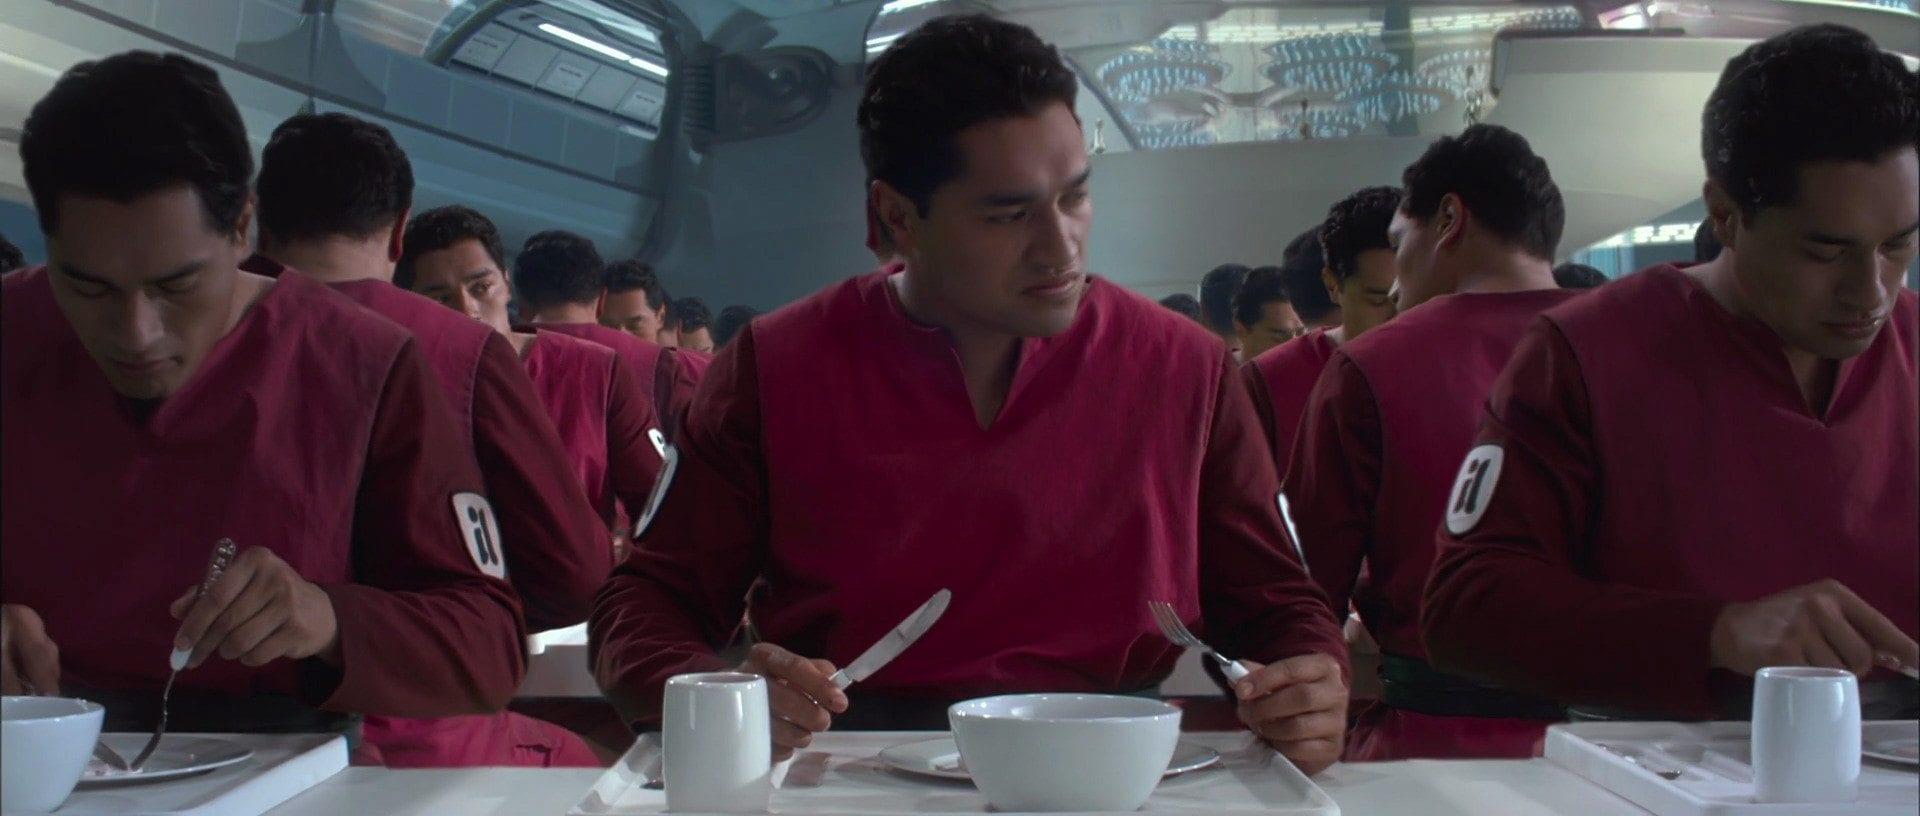 clones eating